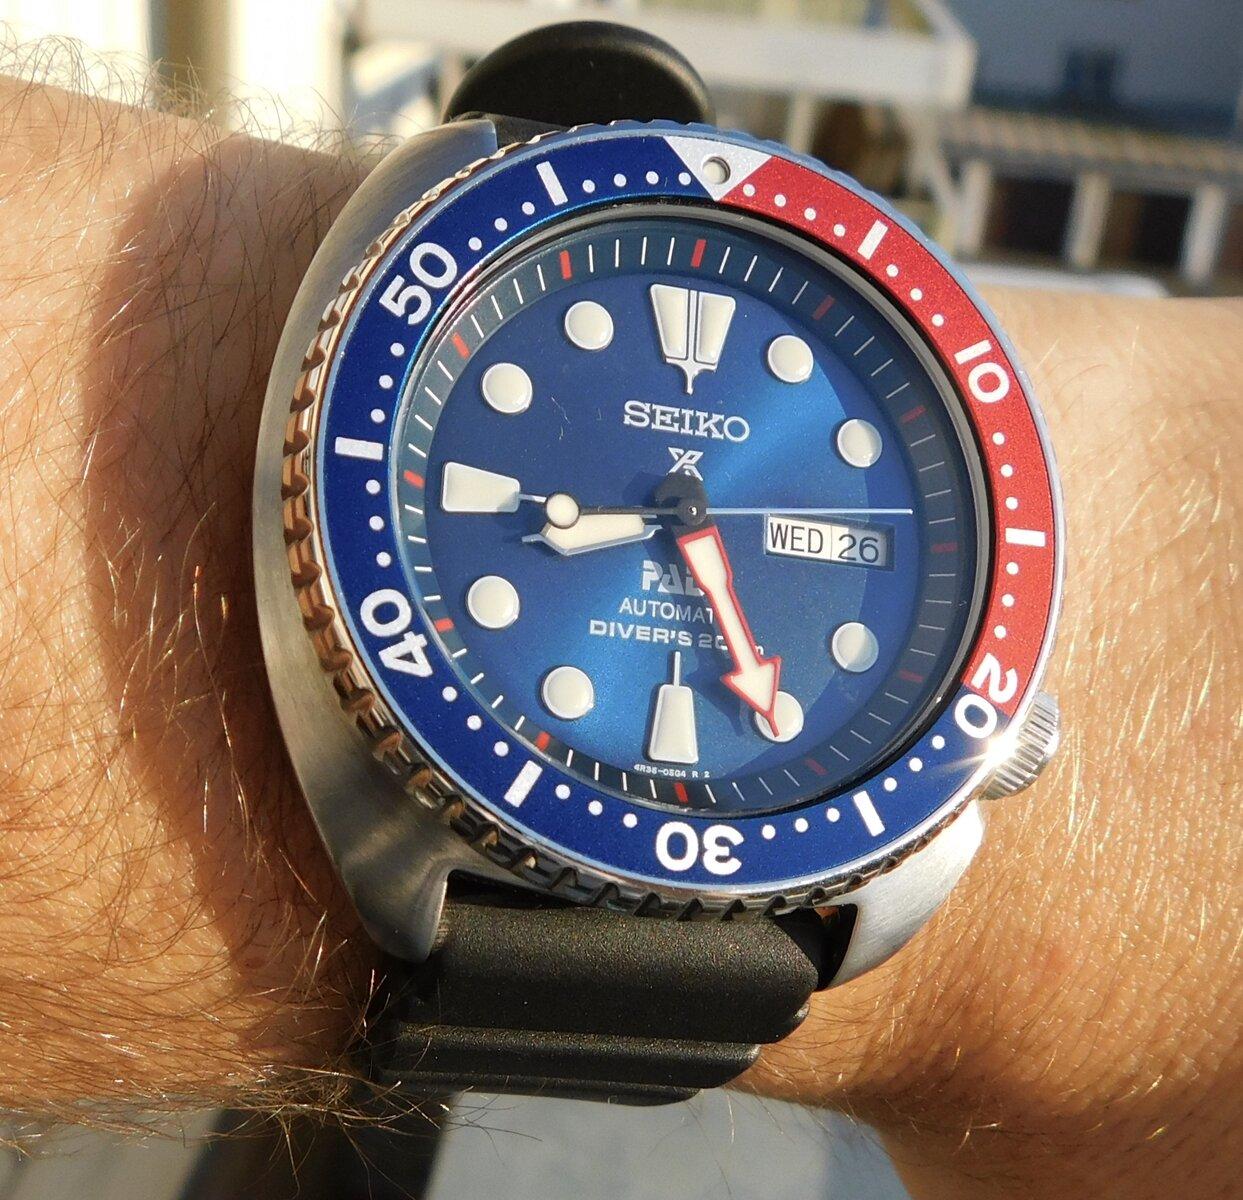 29C109BF-A215-493A-B54E-8205620D1F95.